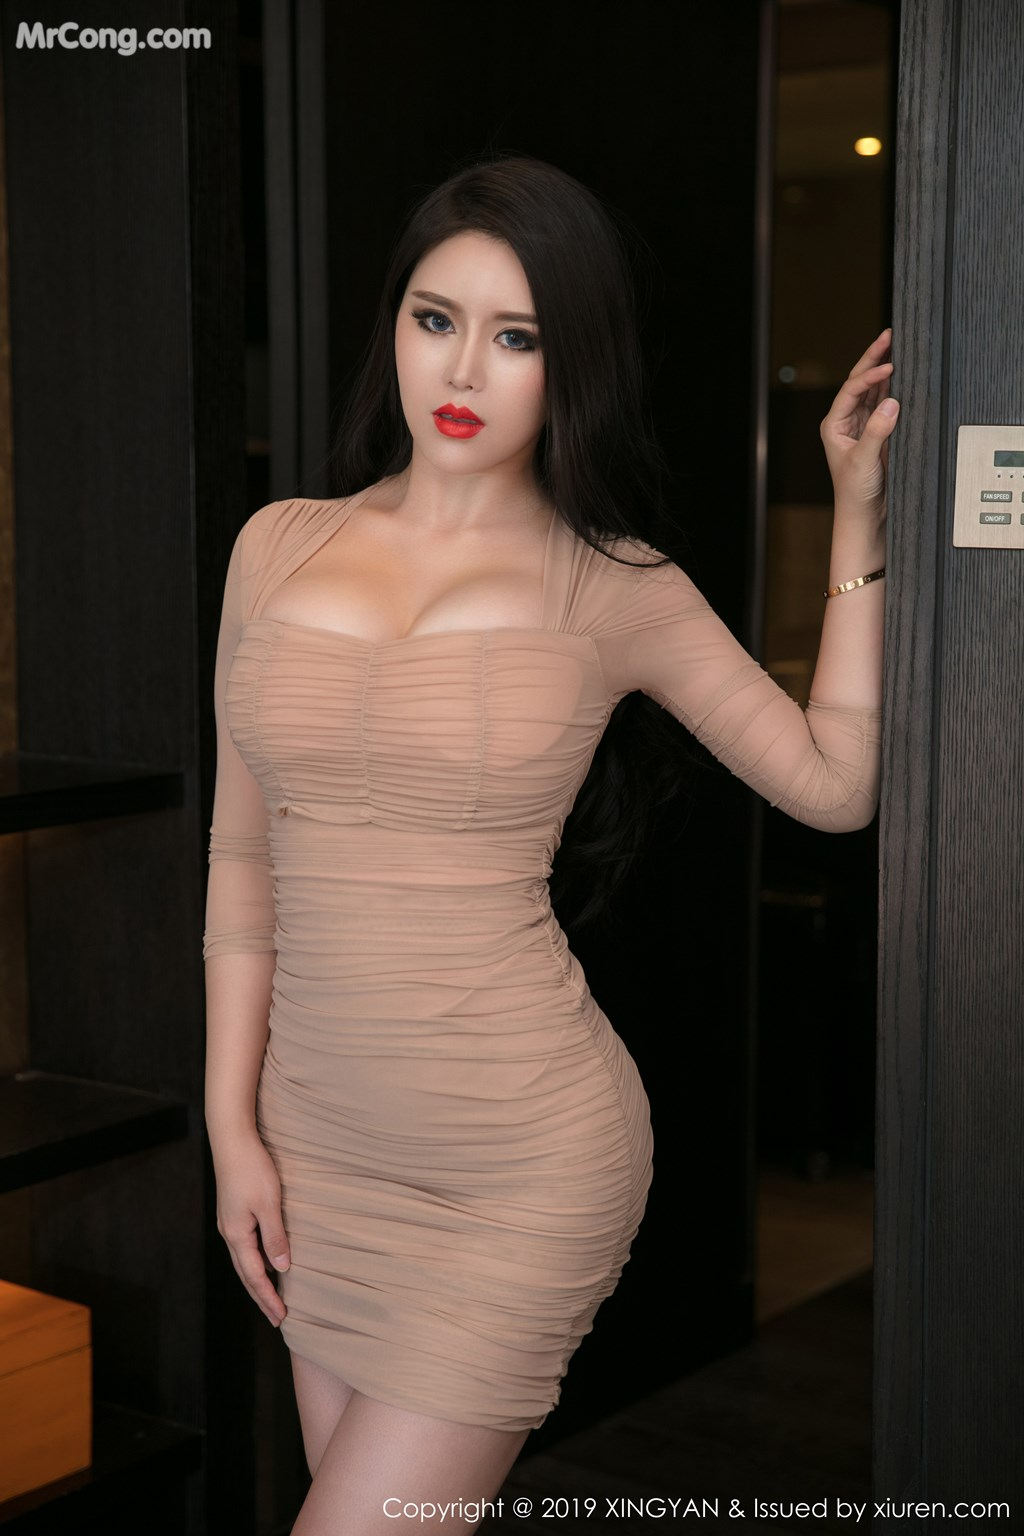 Image XingYan-Vol.111-Ke-Rui-Na-MrCong.com-022 in post XingYan Vol.111: Người mẫu Ke Rui Na (可蕊娜) (52 ảnh)